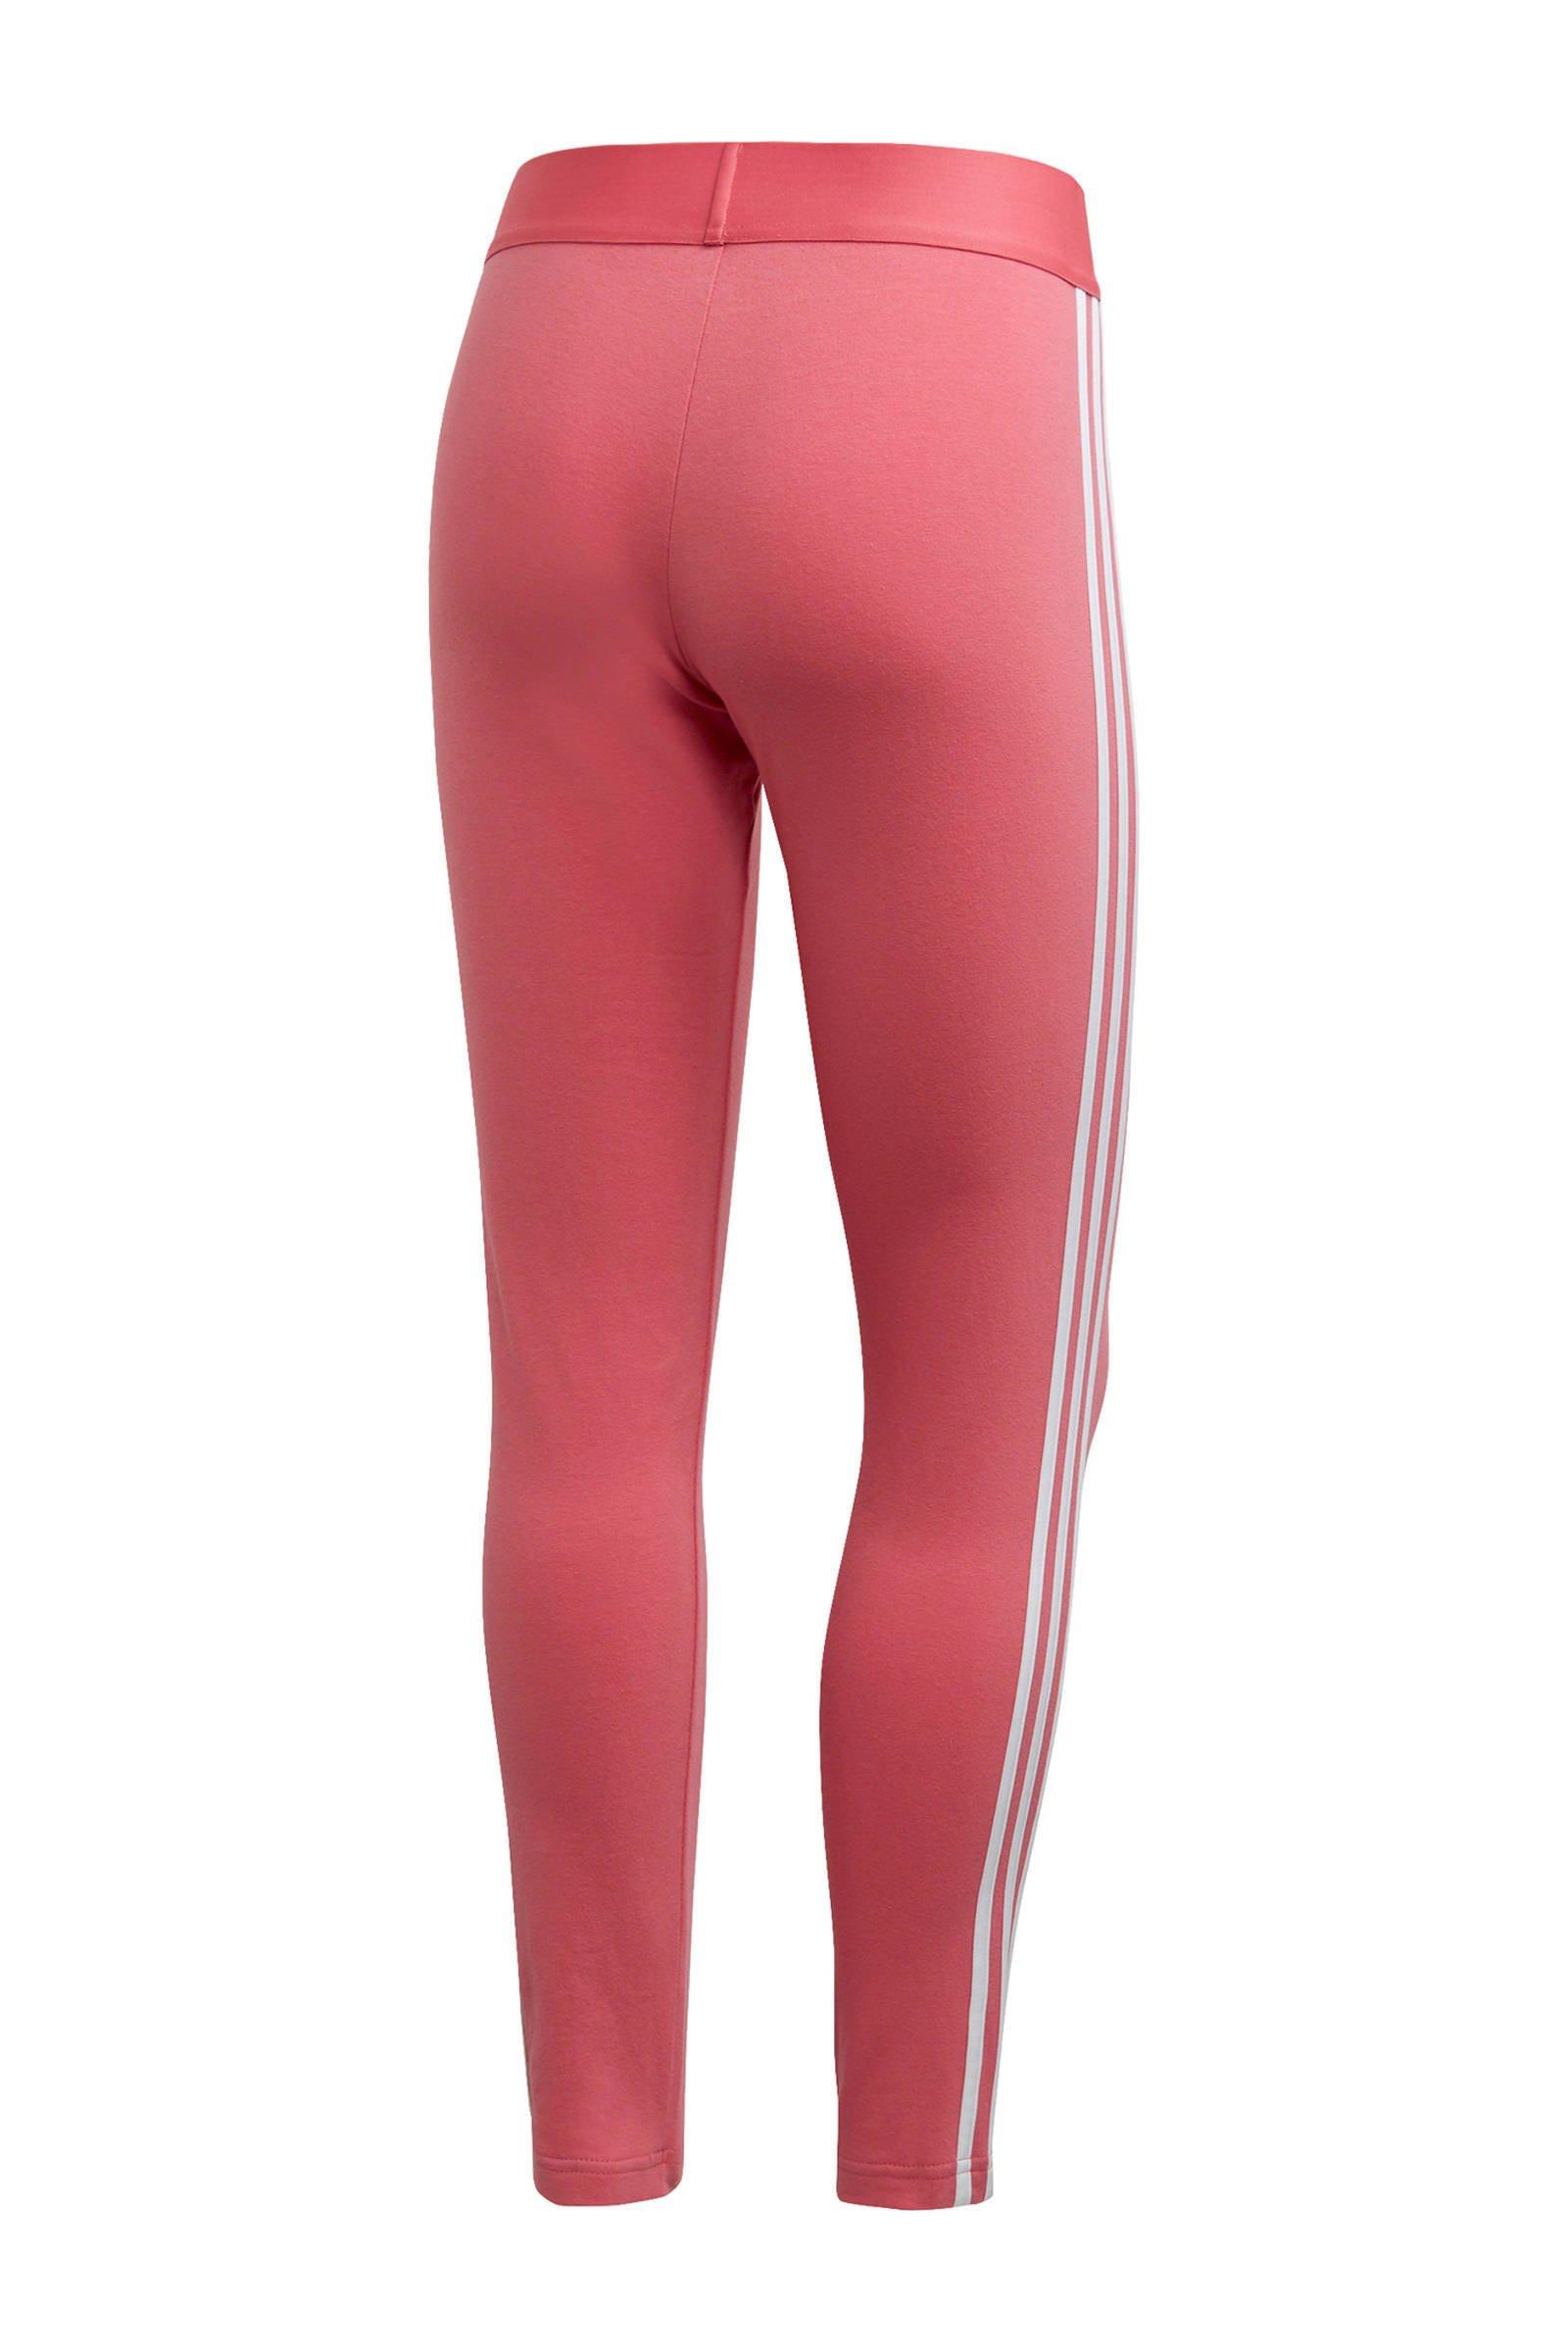 adidas sportbroek roze